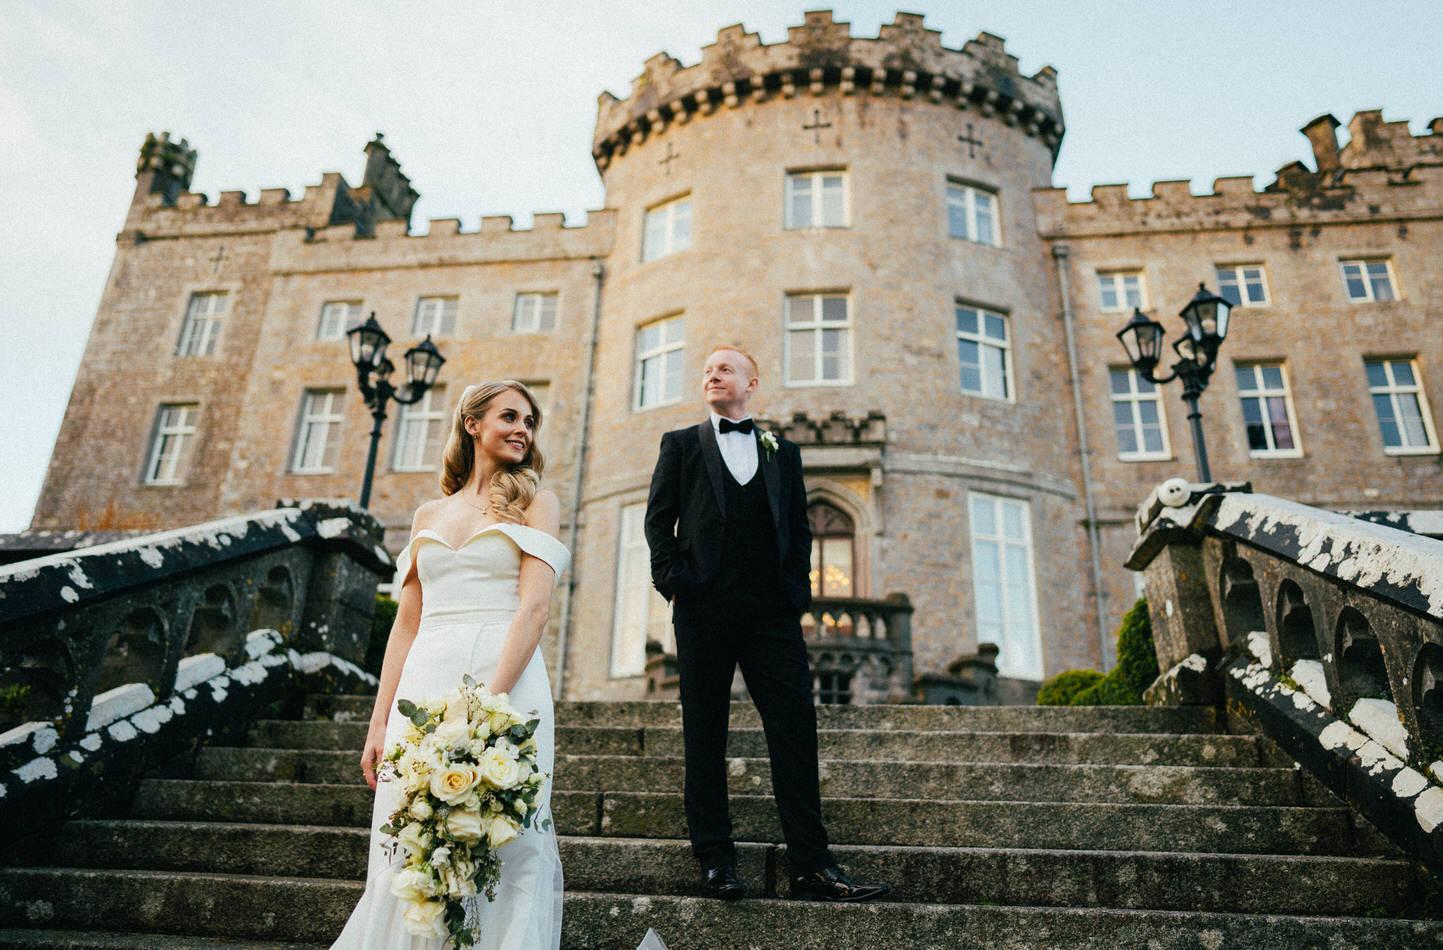 Castle-wedding-ireland-photos- 0195 138